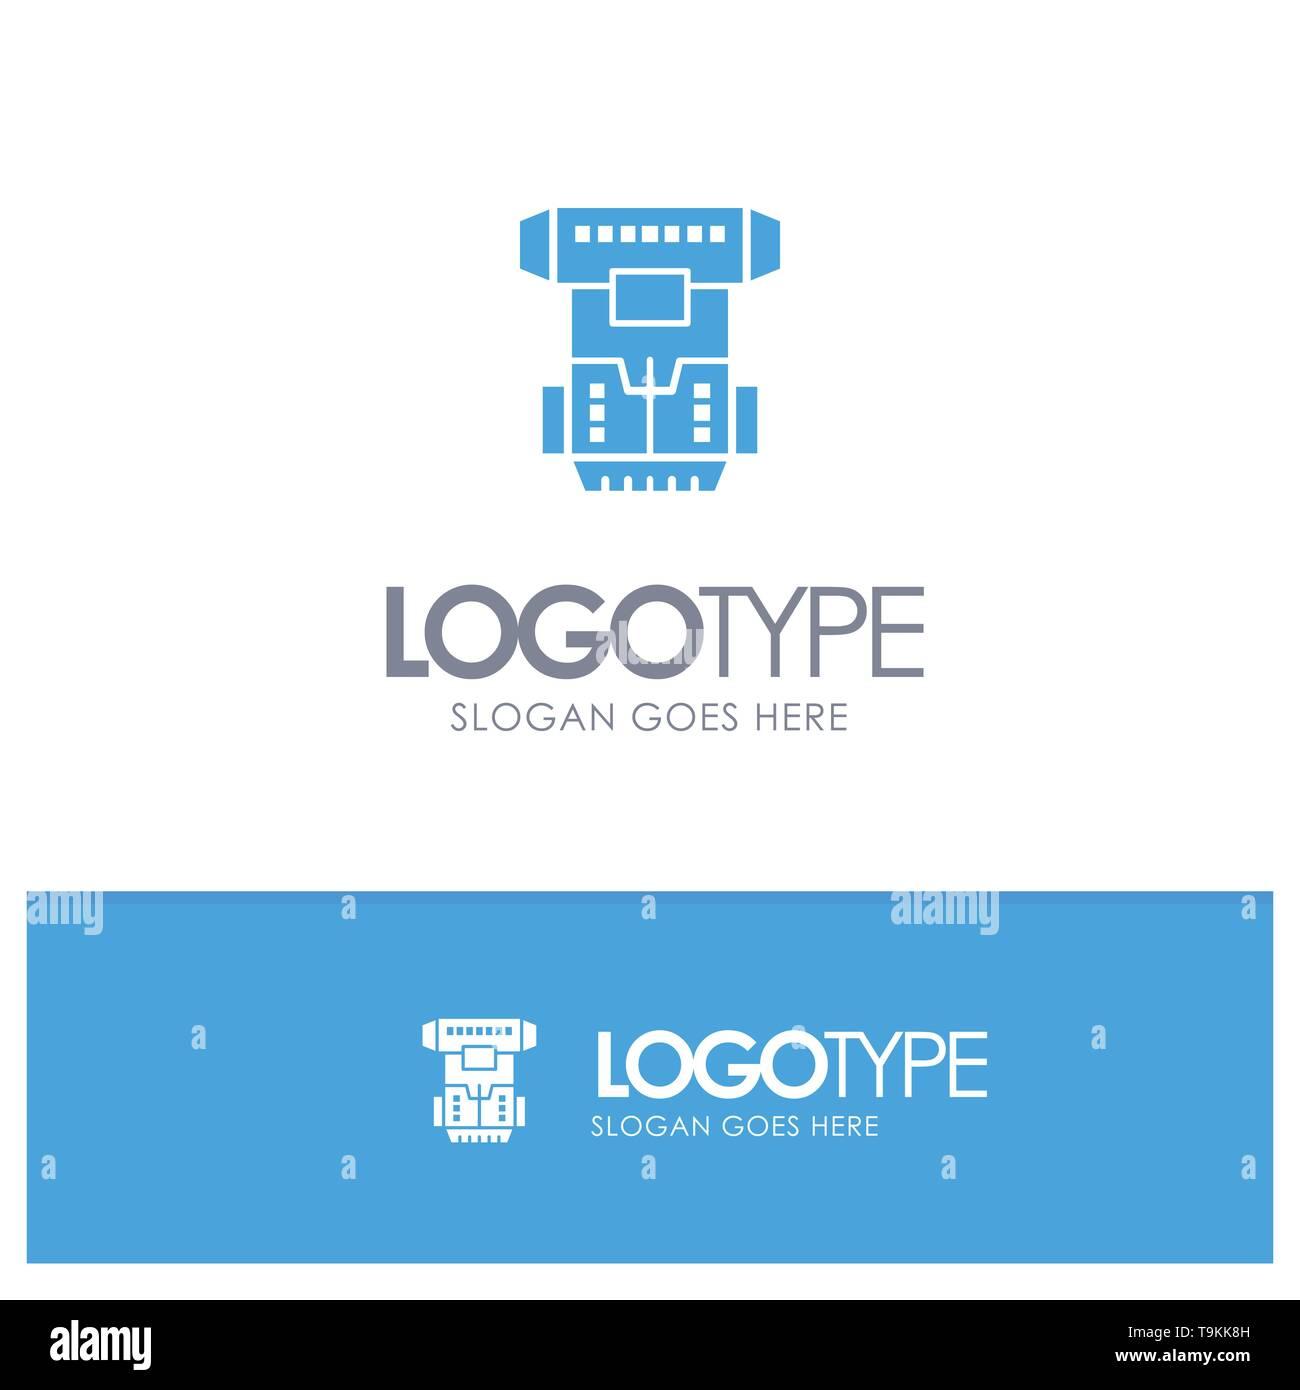 Box, Kammer, kryogene, Kryonik, Kryotherapie Blue Solid Logo mit Slogan Stockbild